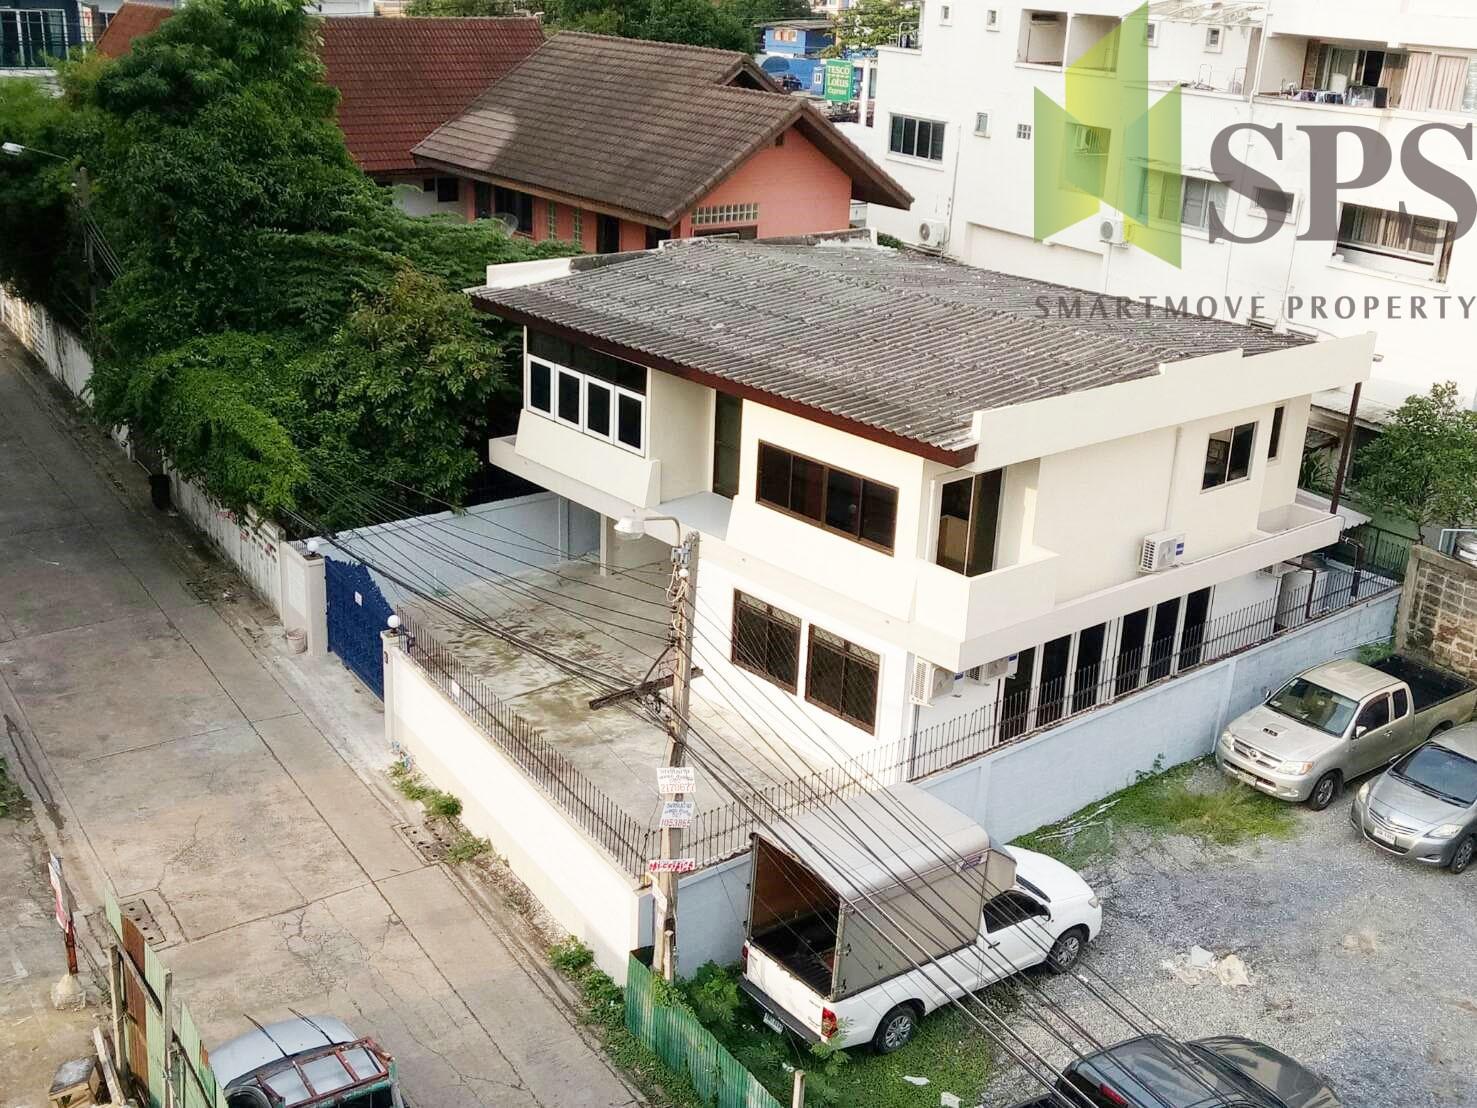 For Rent Single house near MRT Ratchada บ้านให้เช่าใกล้รถไฟใต้ดินรัชดา เหมาะสำหรับเป็น home office( SPSPE324)